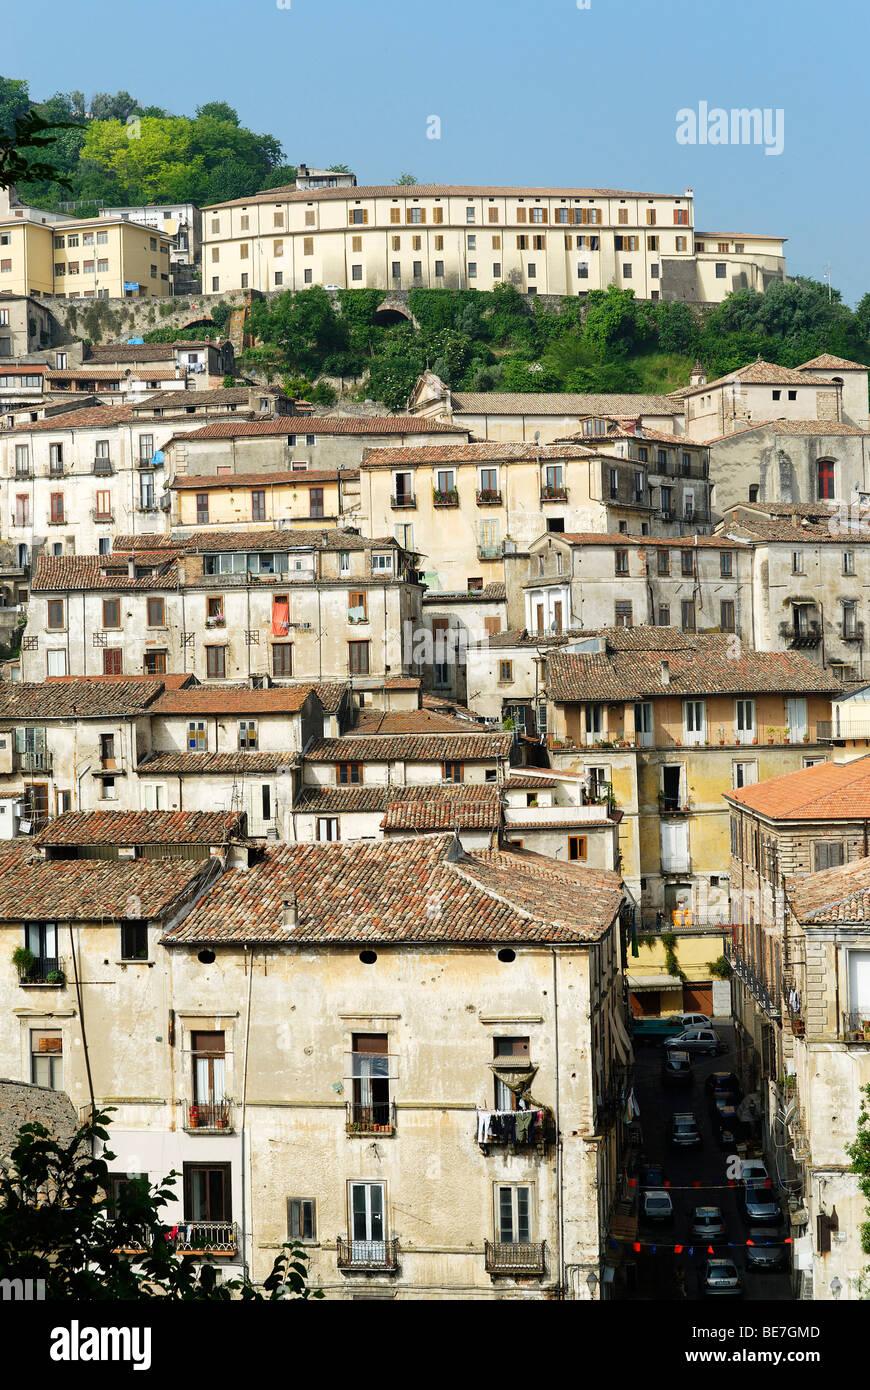 Cosenza, Calabria, Italy, Europe - Stock Image